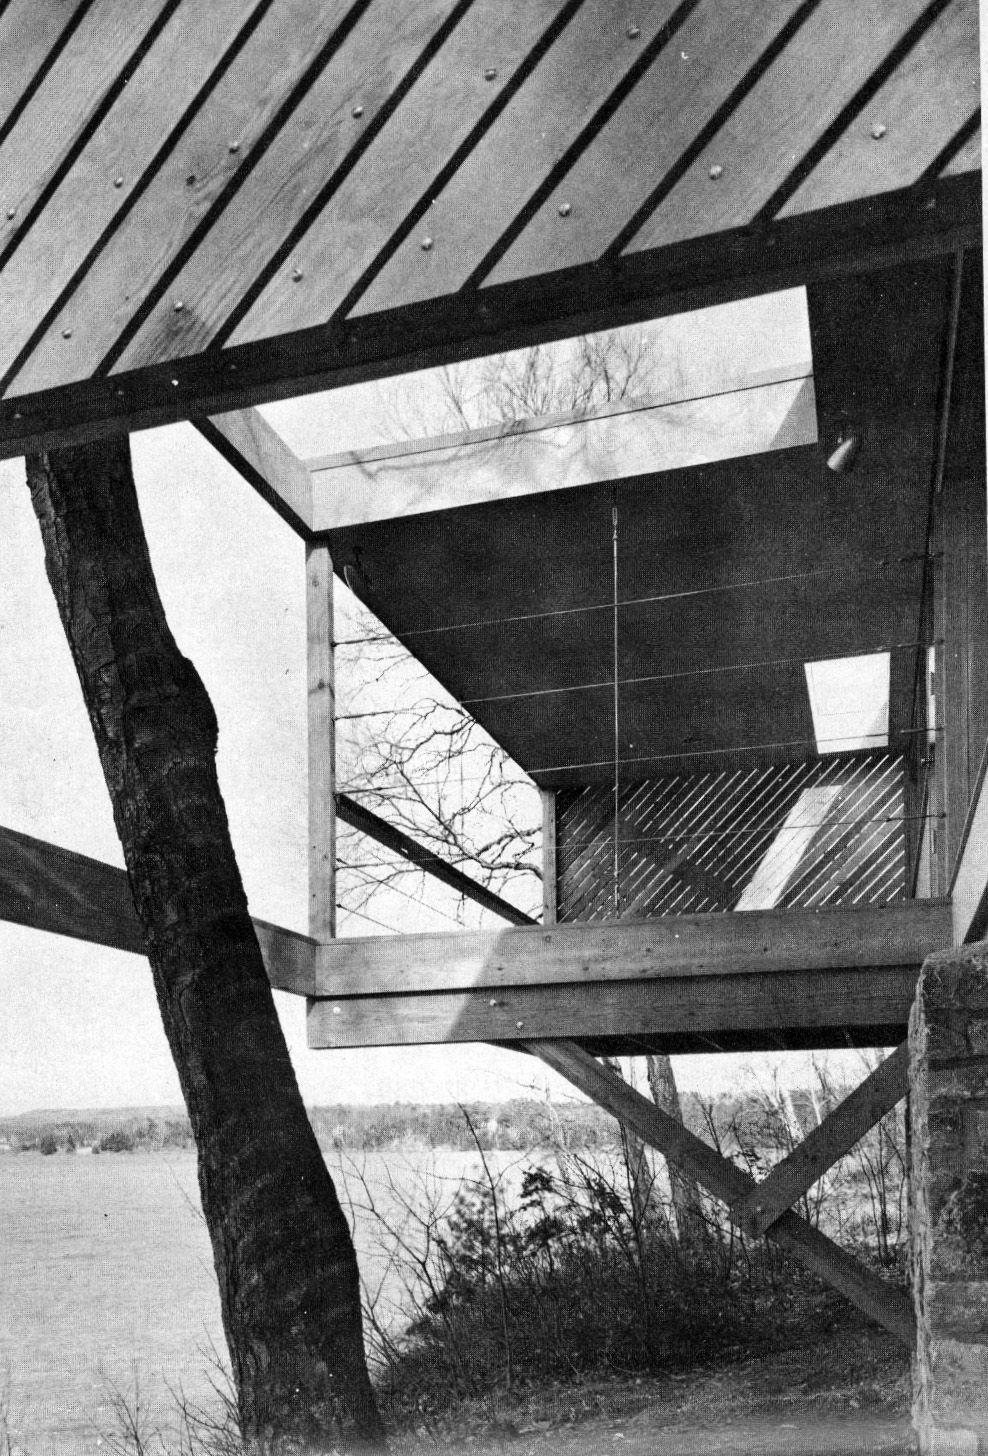 Marcel Breuer Caesar Cottage La Casa Evita Perturbar El Paisaje De Pgina Cesar Flores On Gfci Internal Wiring Diagram Rbol Crece A Travs Estructura Sun And Shadow 1956